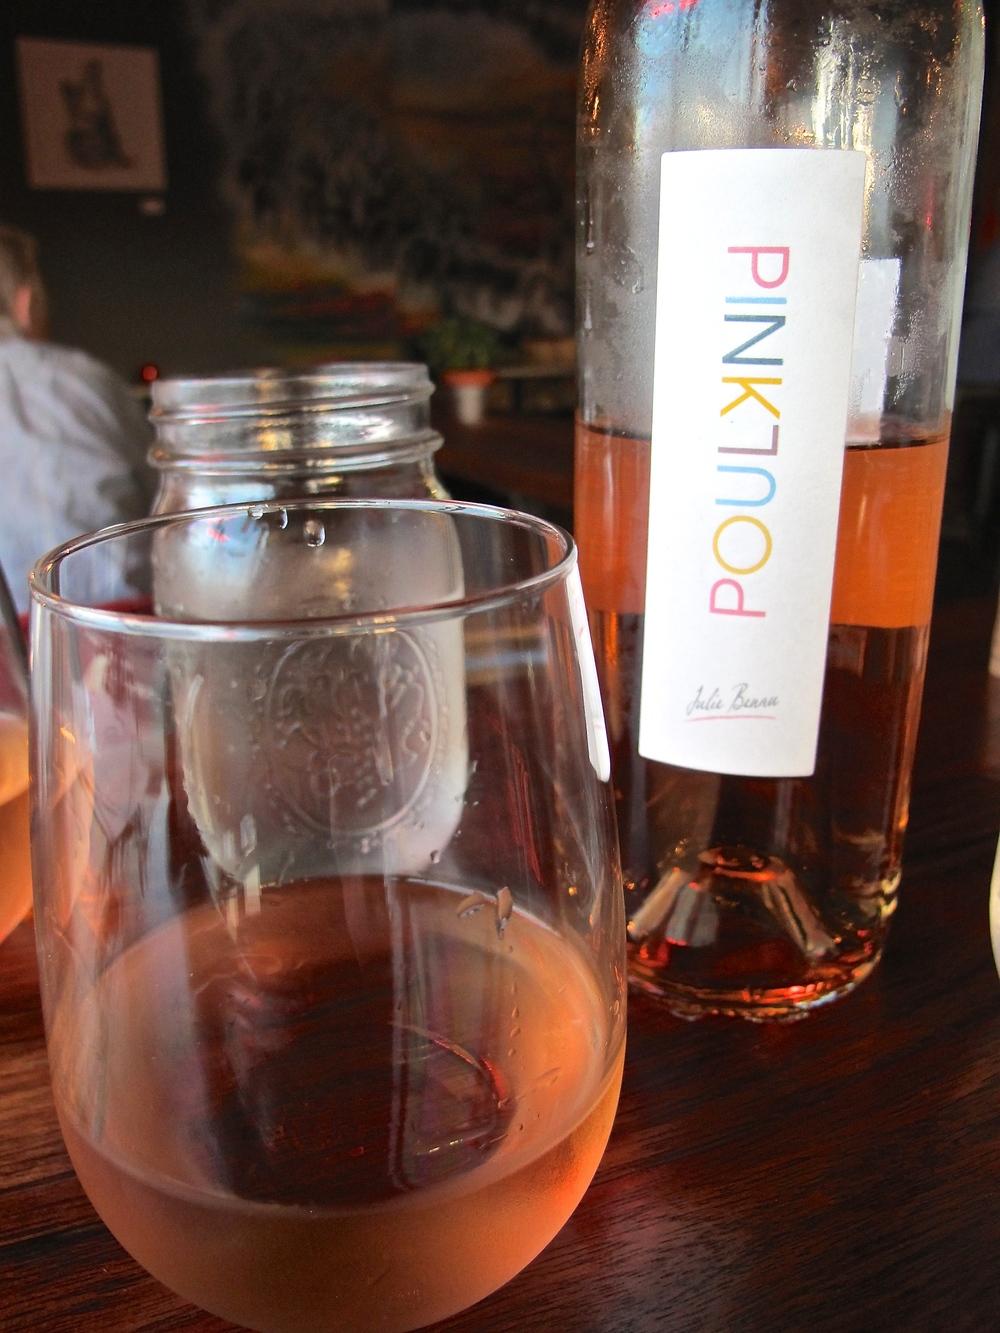 PinkPoul Rose